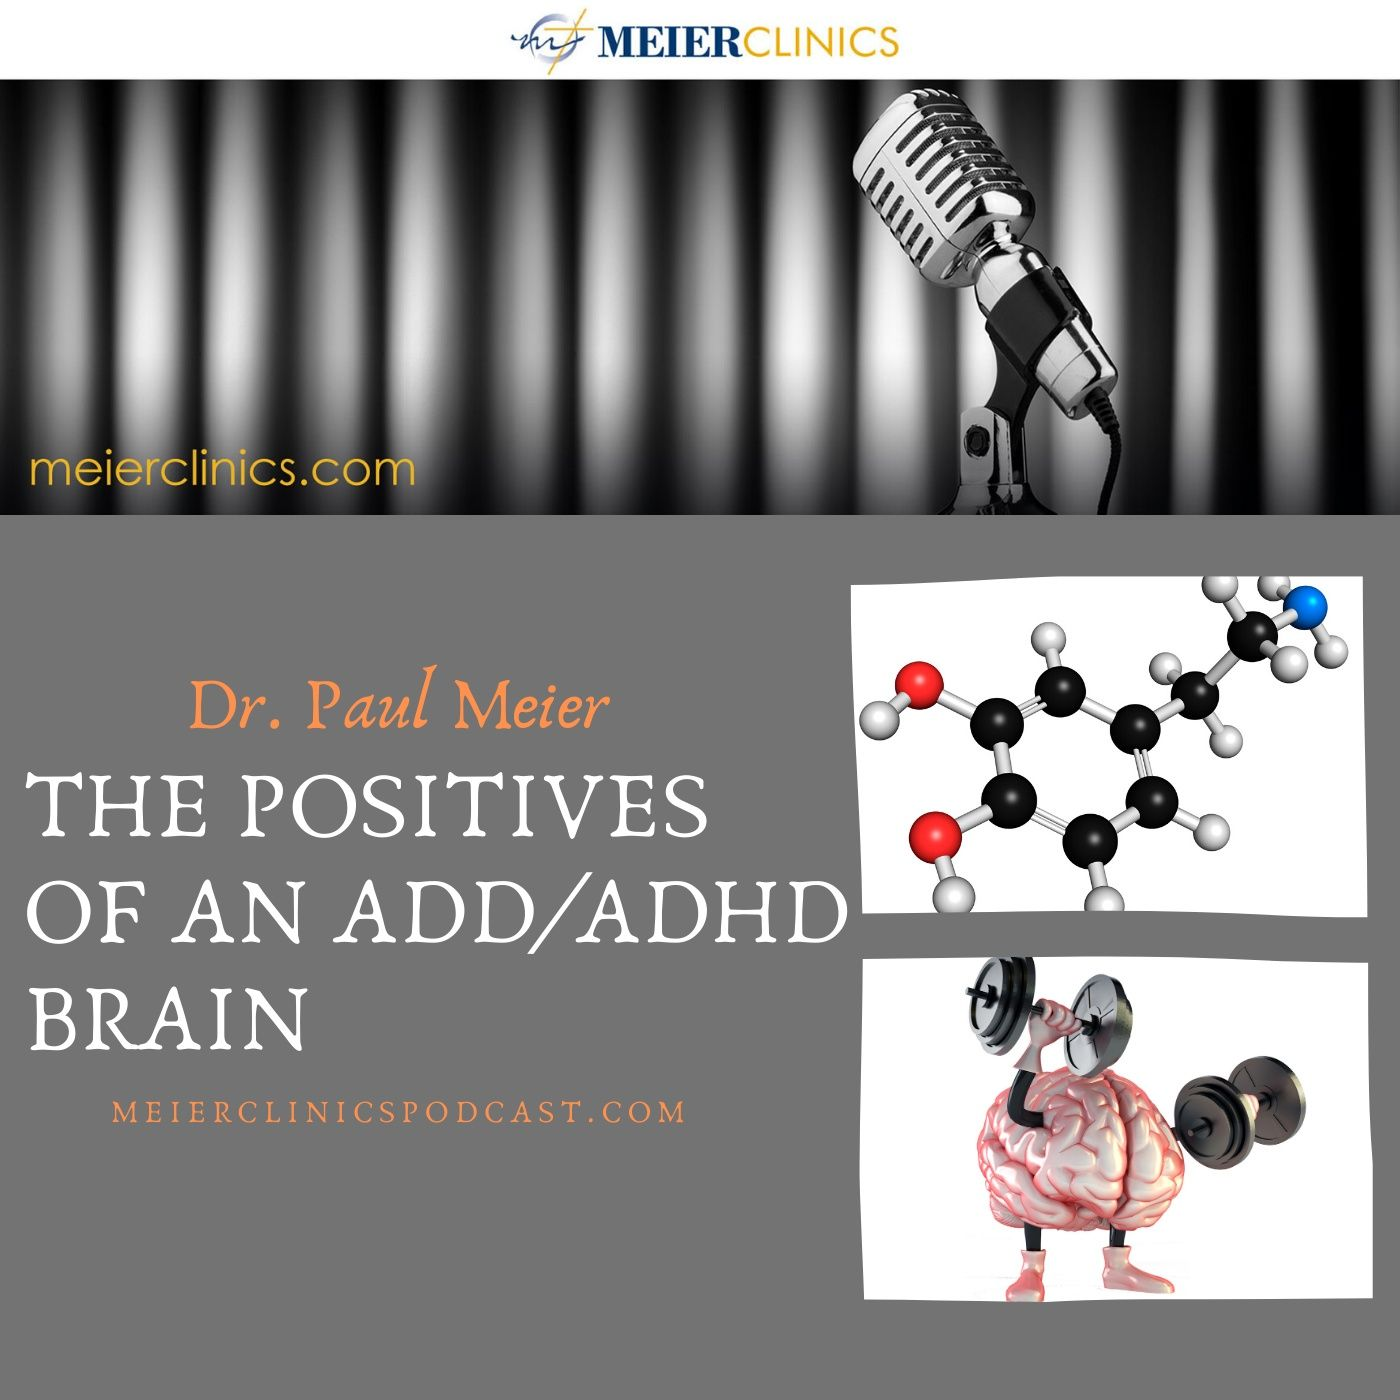 The Positives of an ADD/ADHD Brain with Dr. Paul Meier